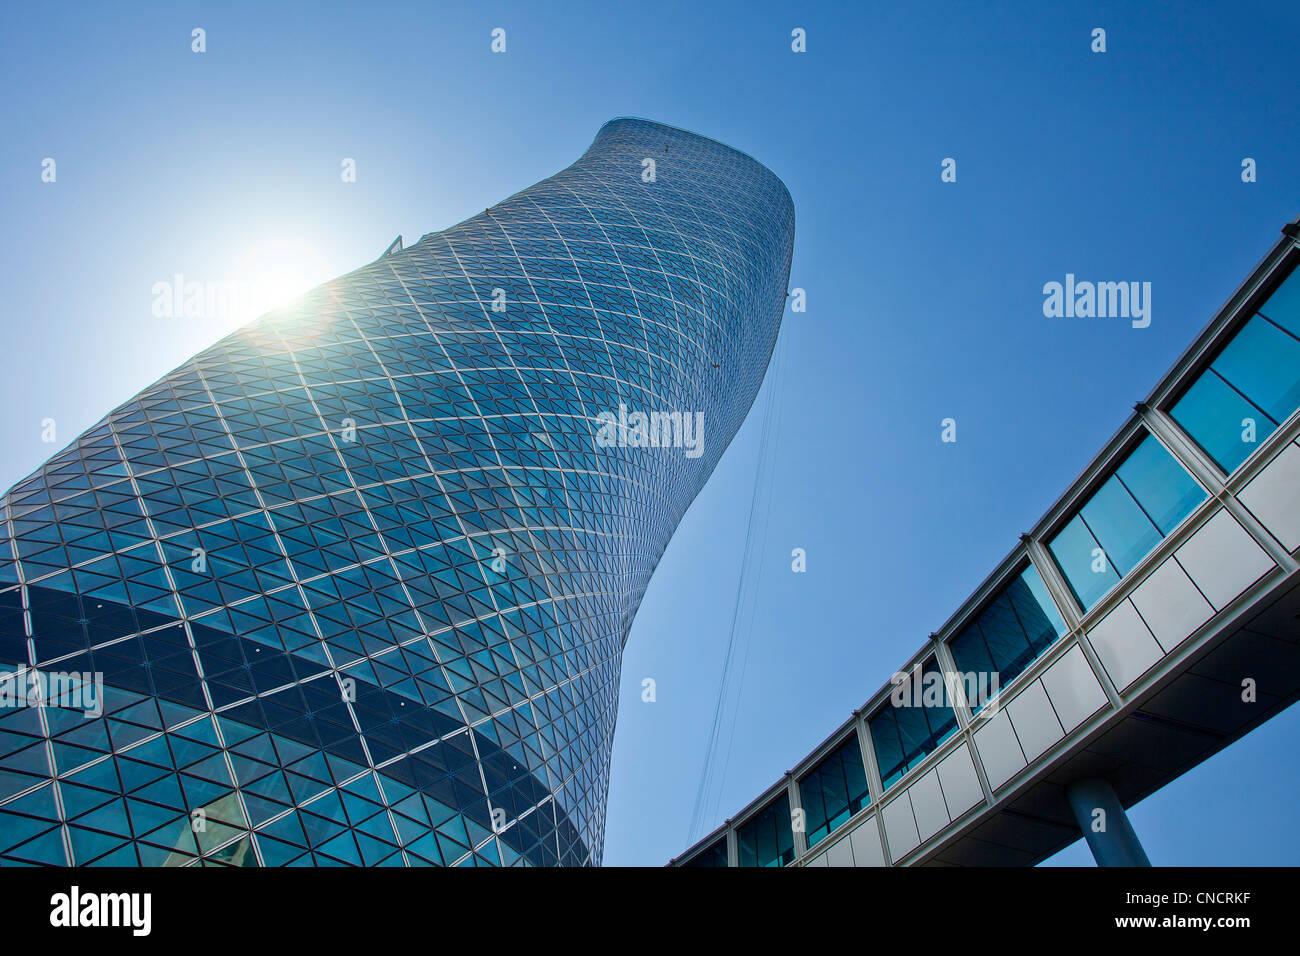 Abu Dhabi , Hyatt Capital gate Hotel Photo Stock